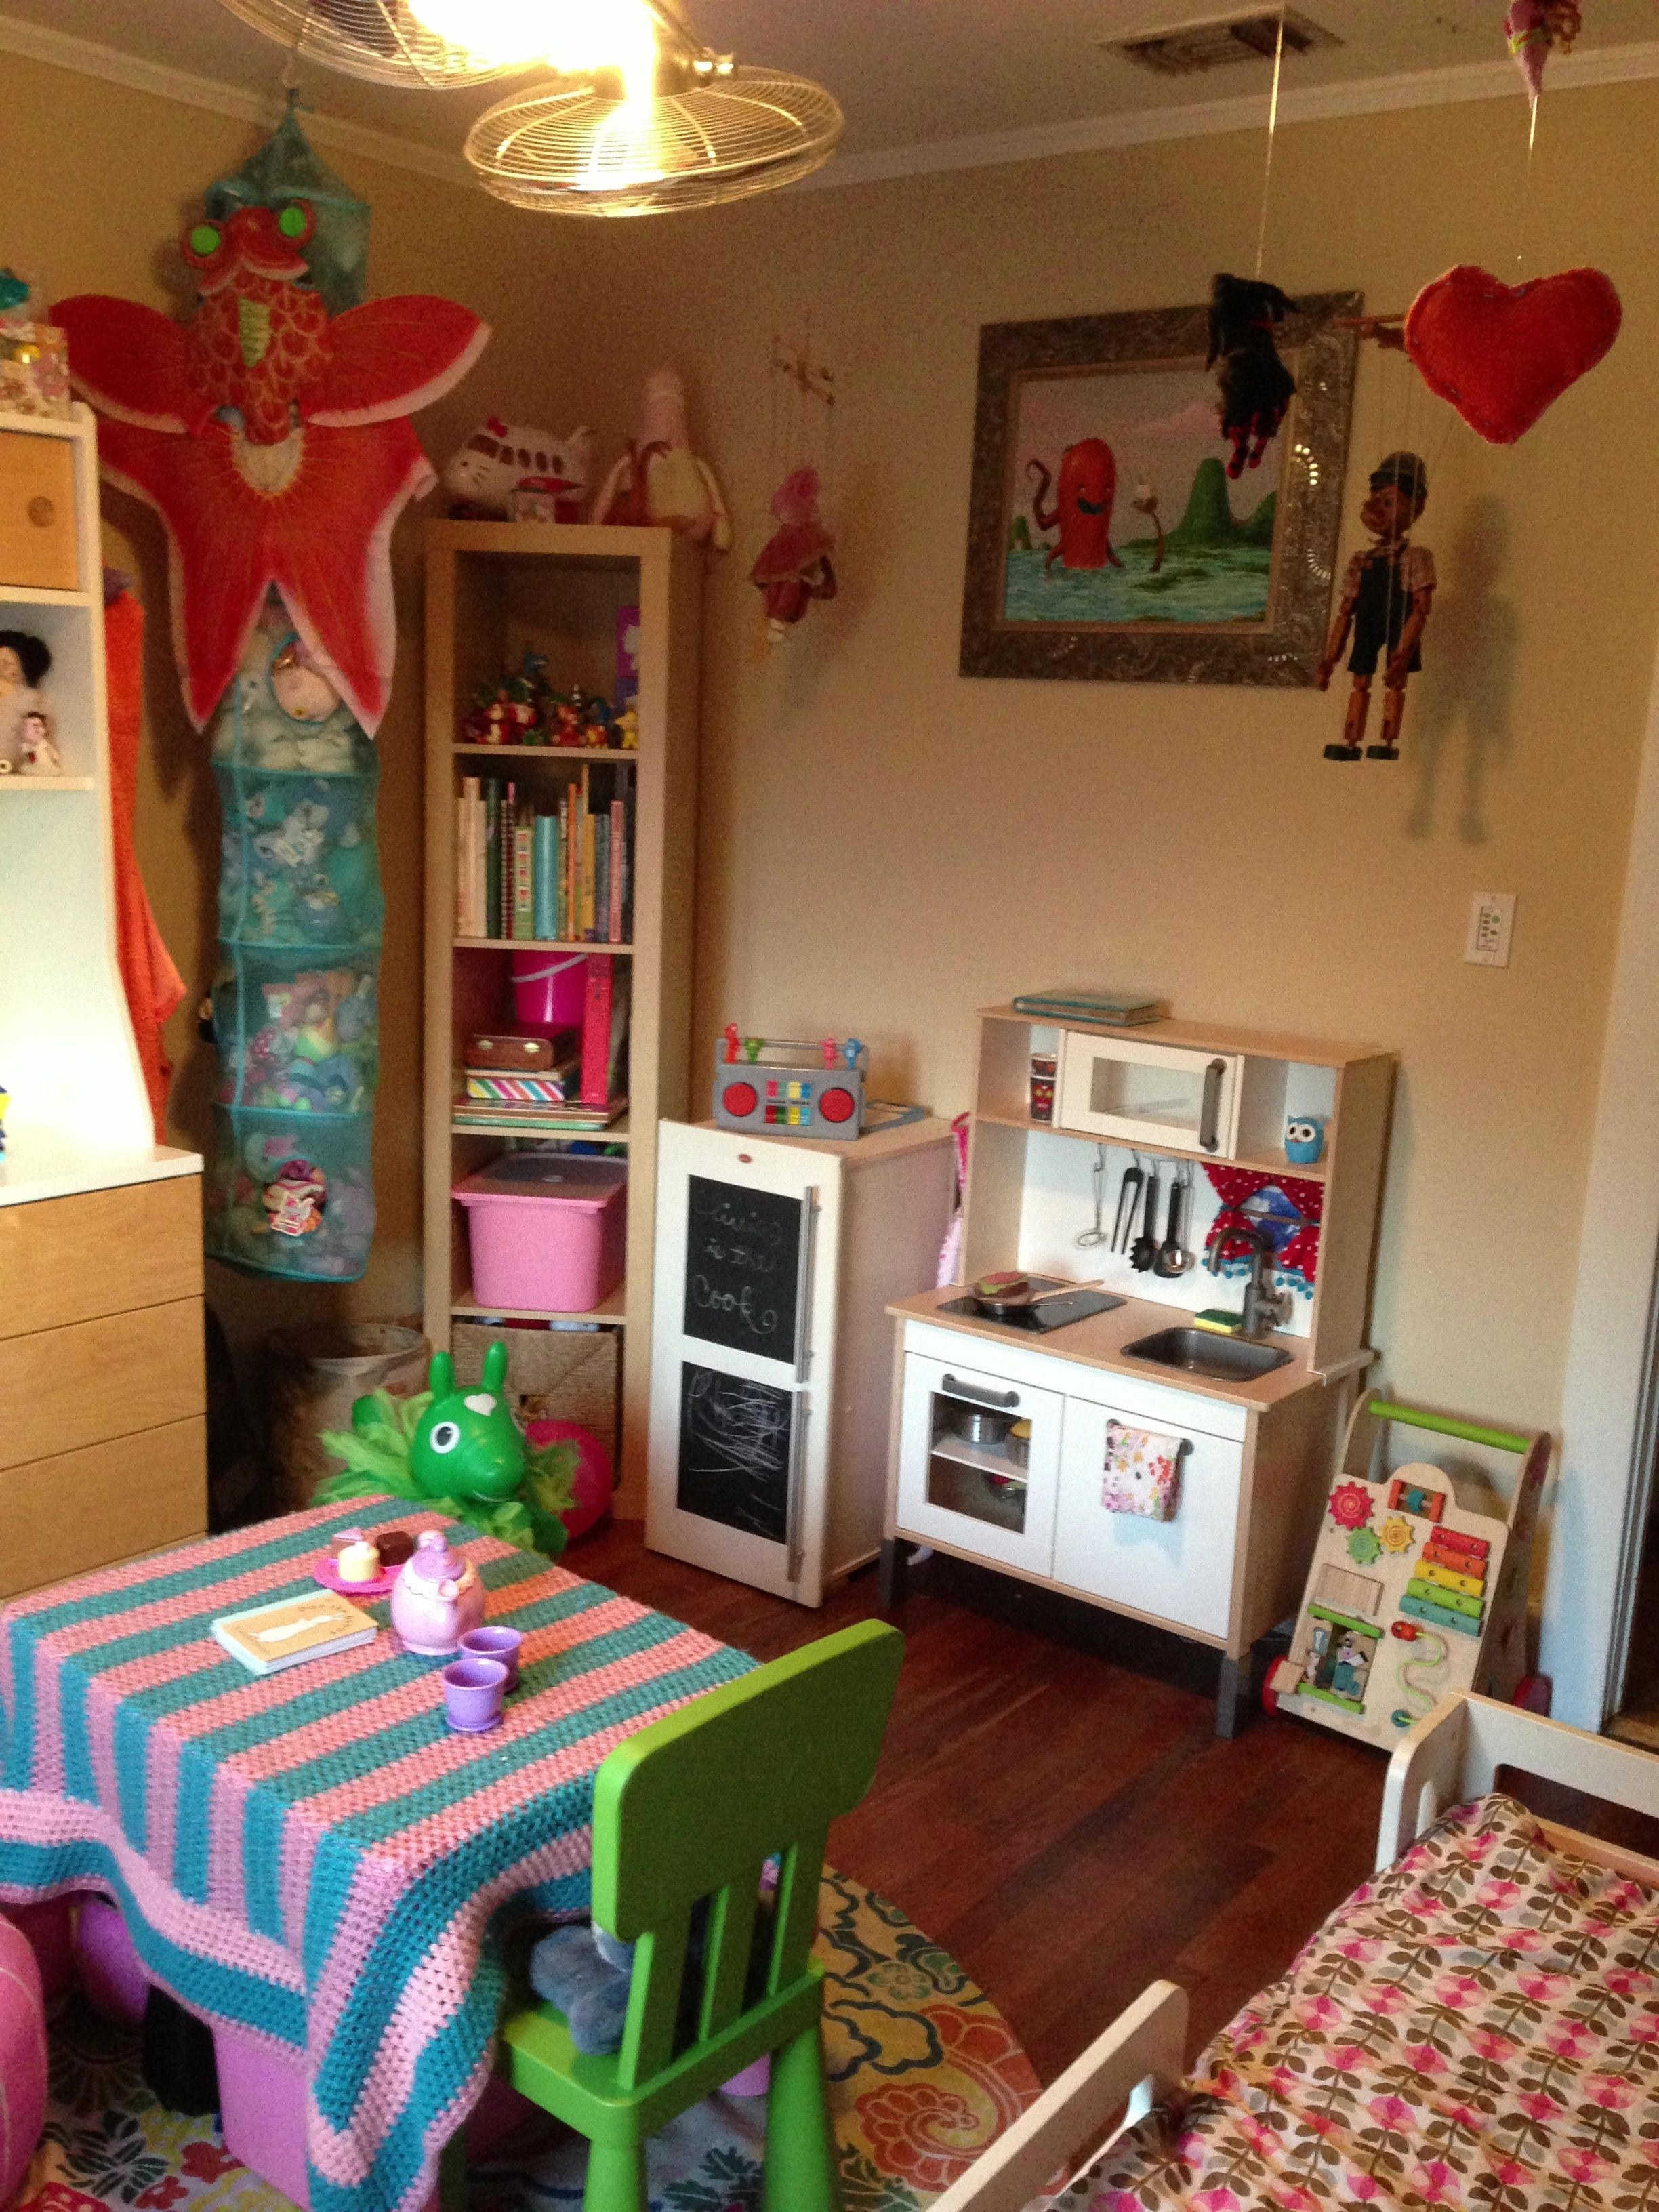 Ikea duktig play kitchen and fridge cocinas bonitas - Cocinas bonitas ...